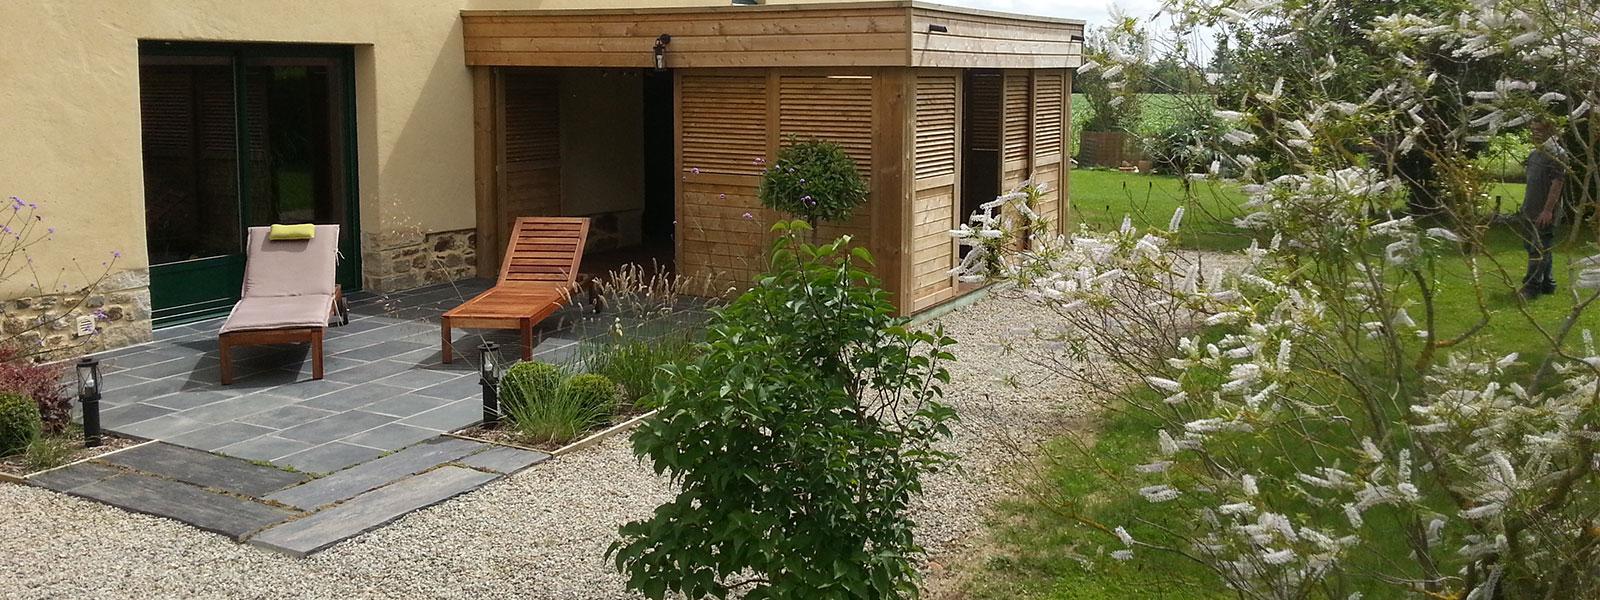 Terrasse pergolas les jardins d 39 hortense for Entretien jardin montauban